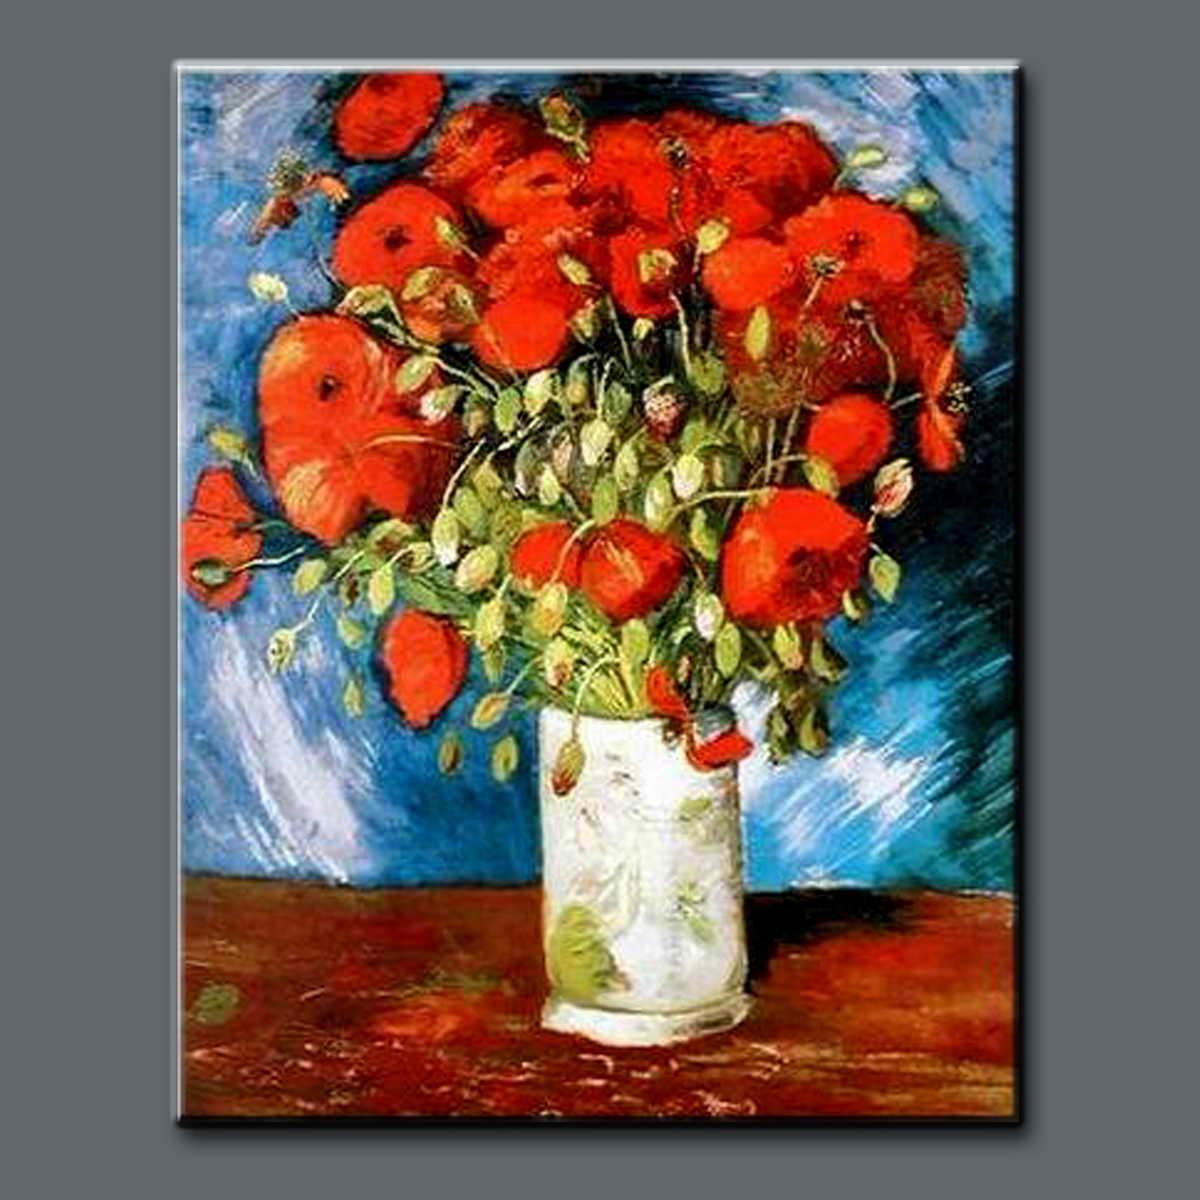 Handmade vincent van gogh romantic flower oil painting with vase handmade vincent van gogh romantic flower oil painting with vase reviewsmspy